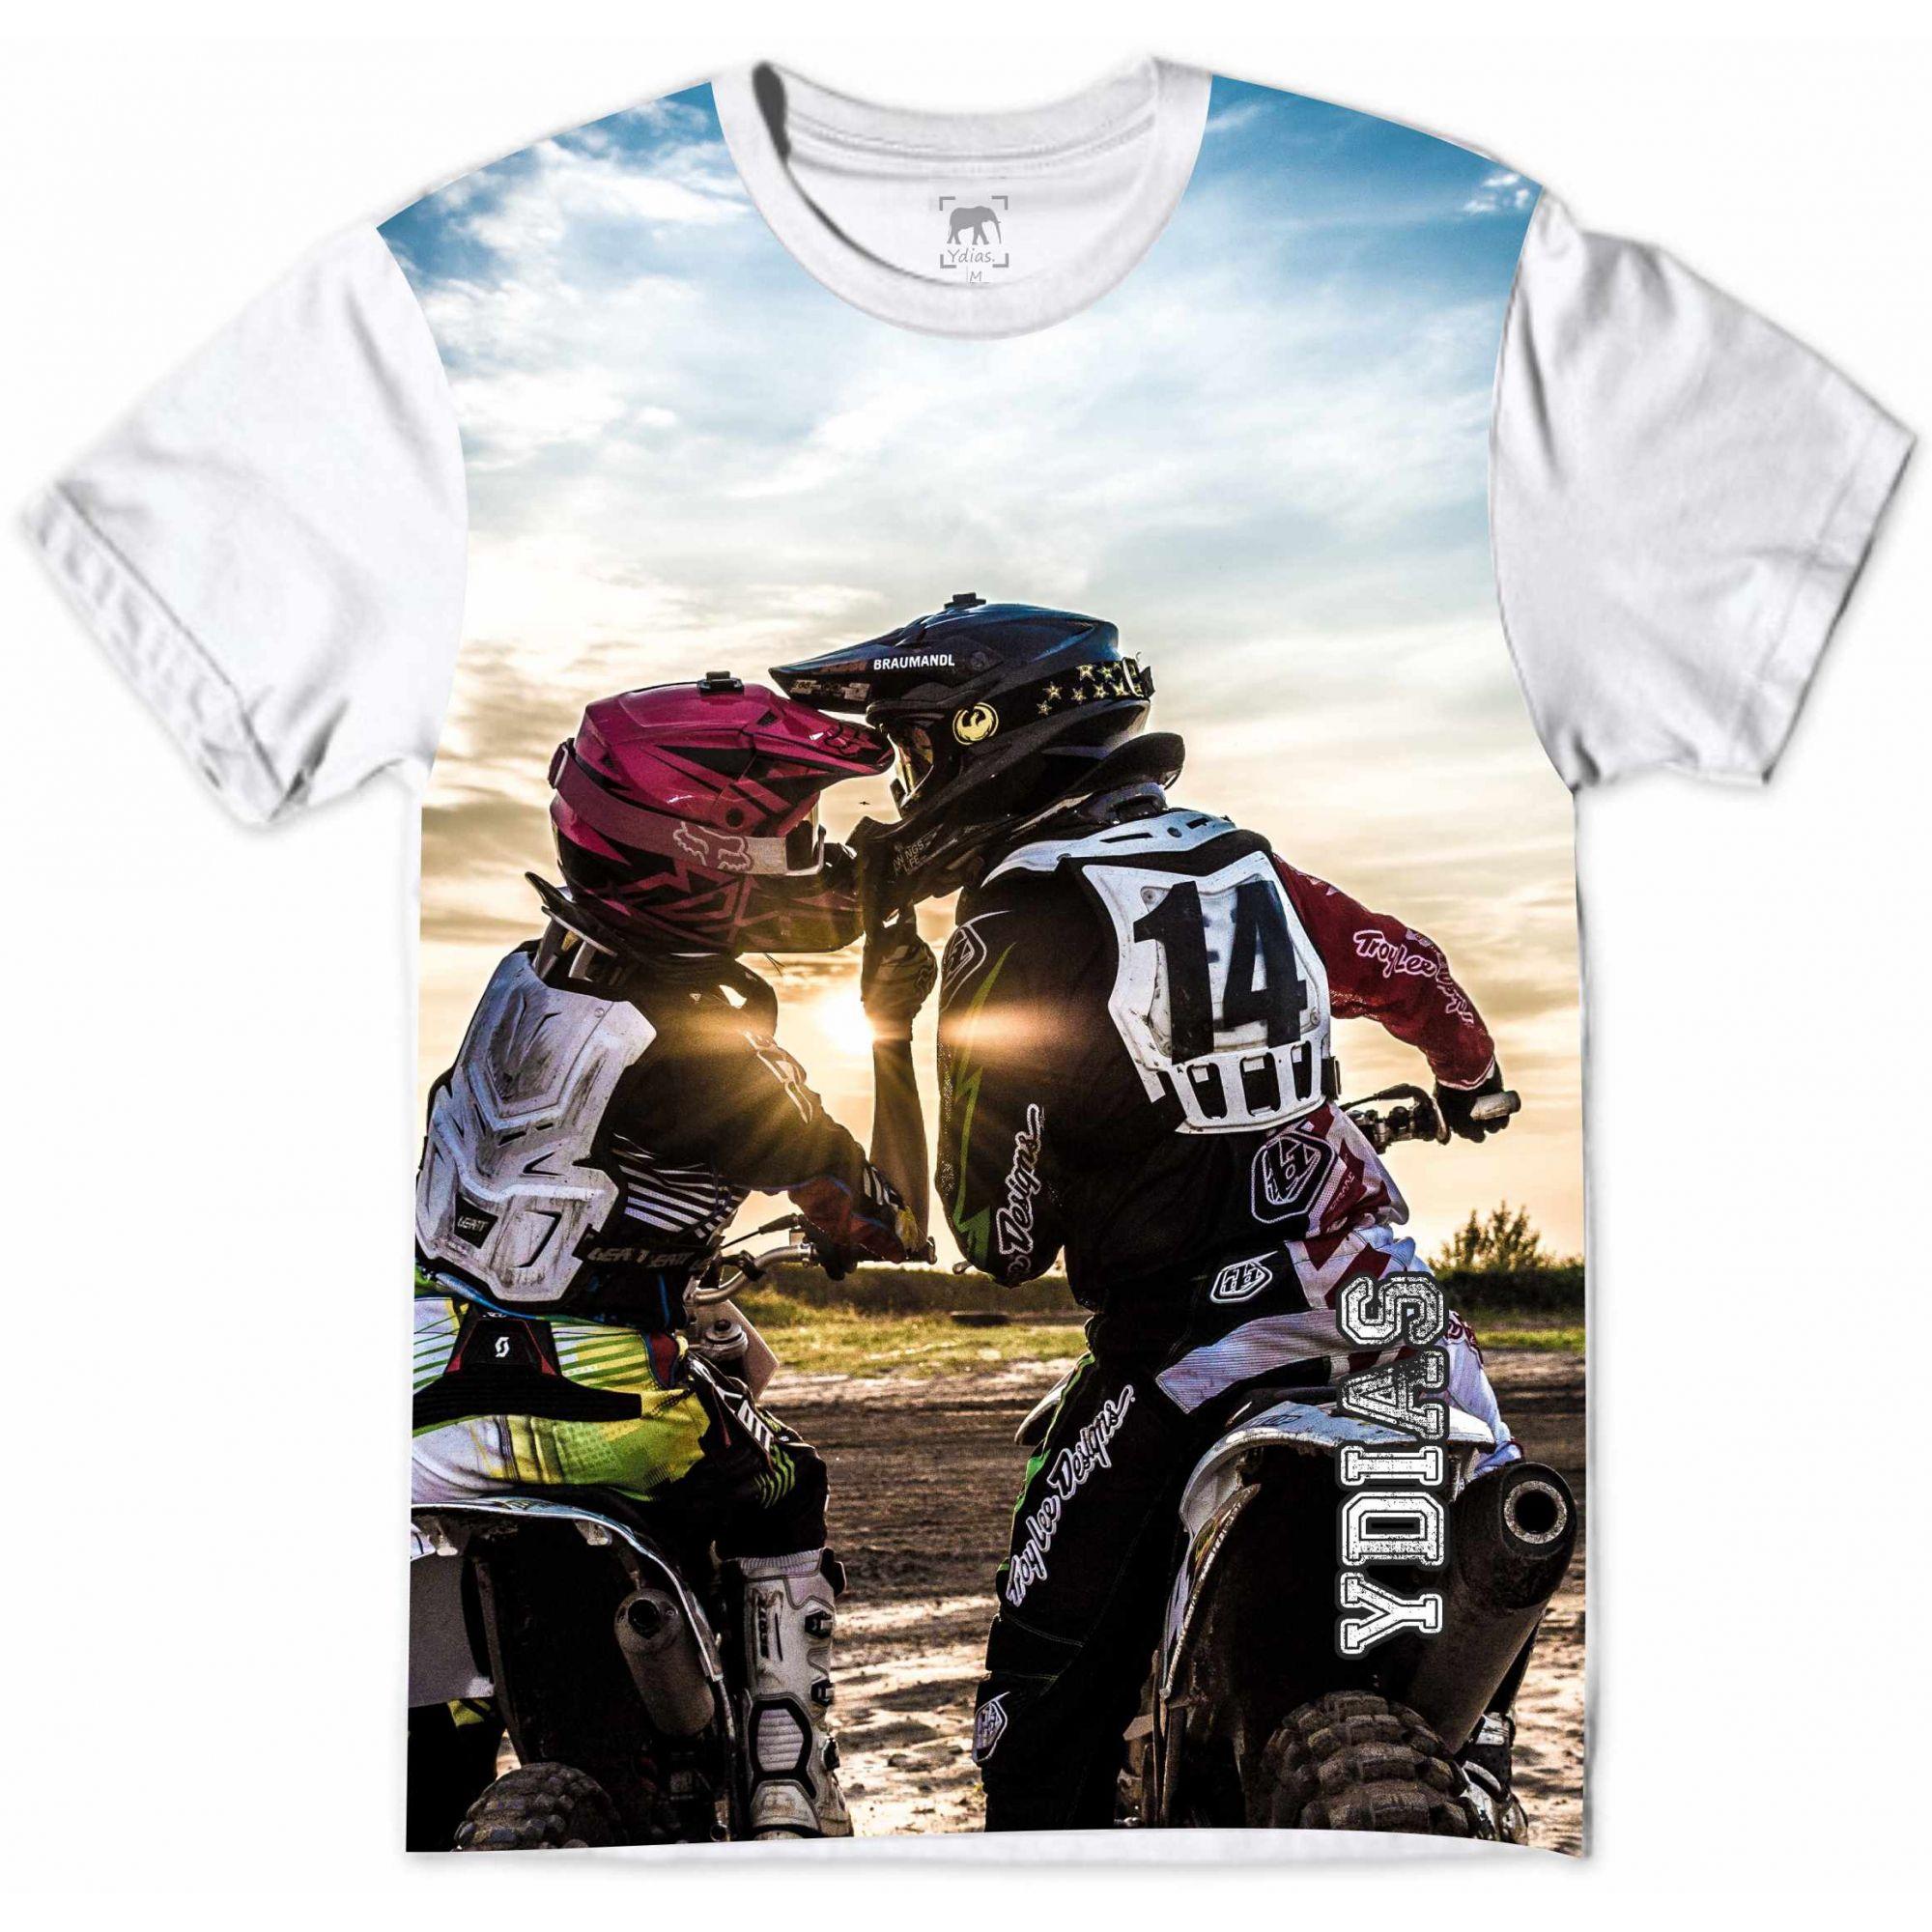 Camiseta Motocross Casal Apaixonado Sunset Ydias Store A Maior